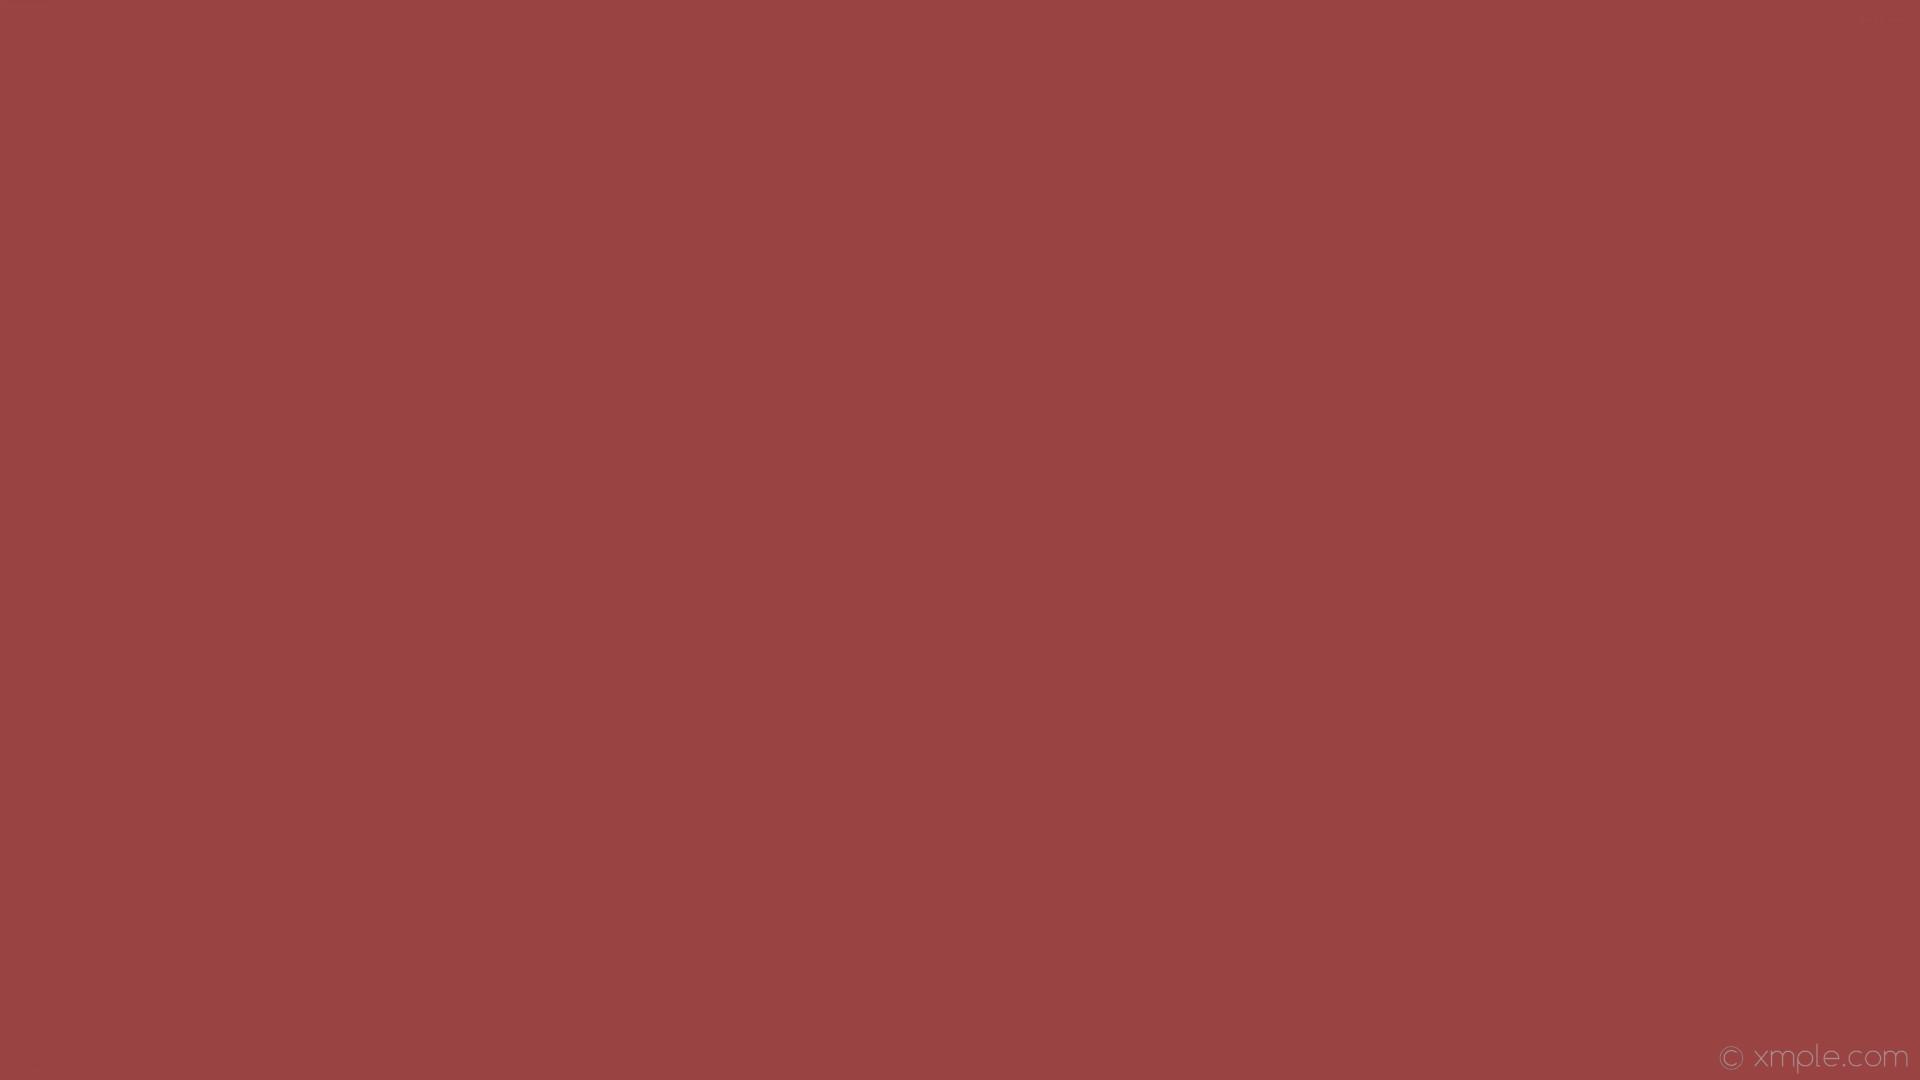 1920x1080 Wallpaper Solid Color Plain Pink One Colour Single Dark 580137